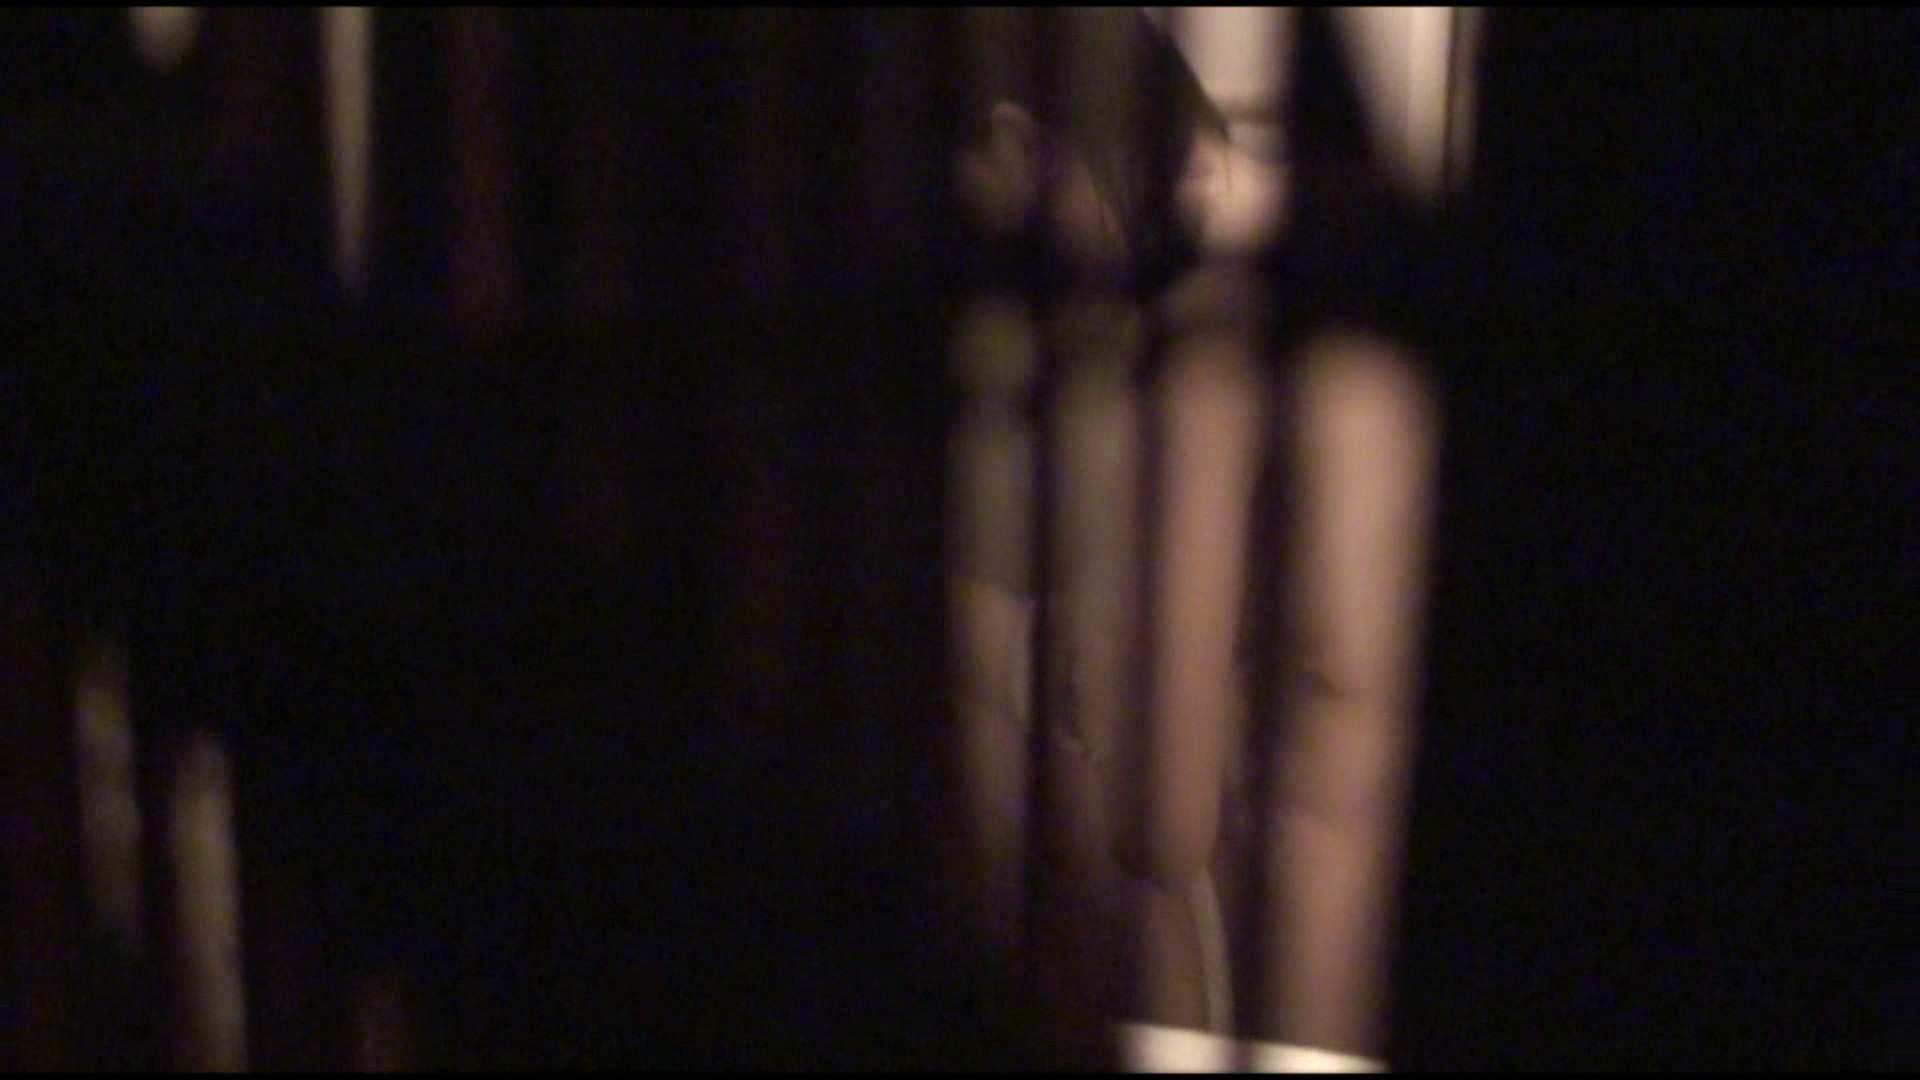 vol.05最高の極上美人!可愛い彼女の裸体をどうぞ!風呂上り鏡チェックも必見! 美人  68pic 51